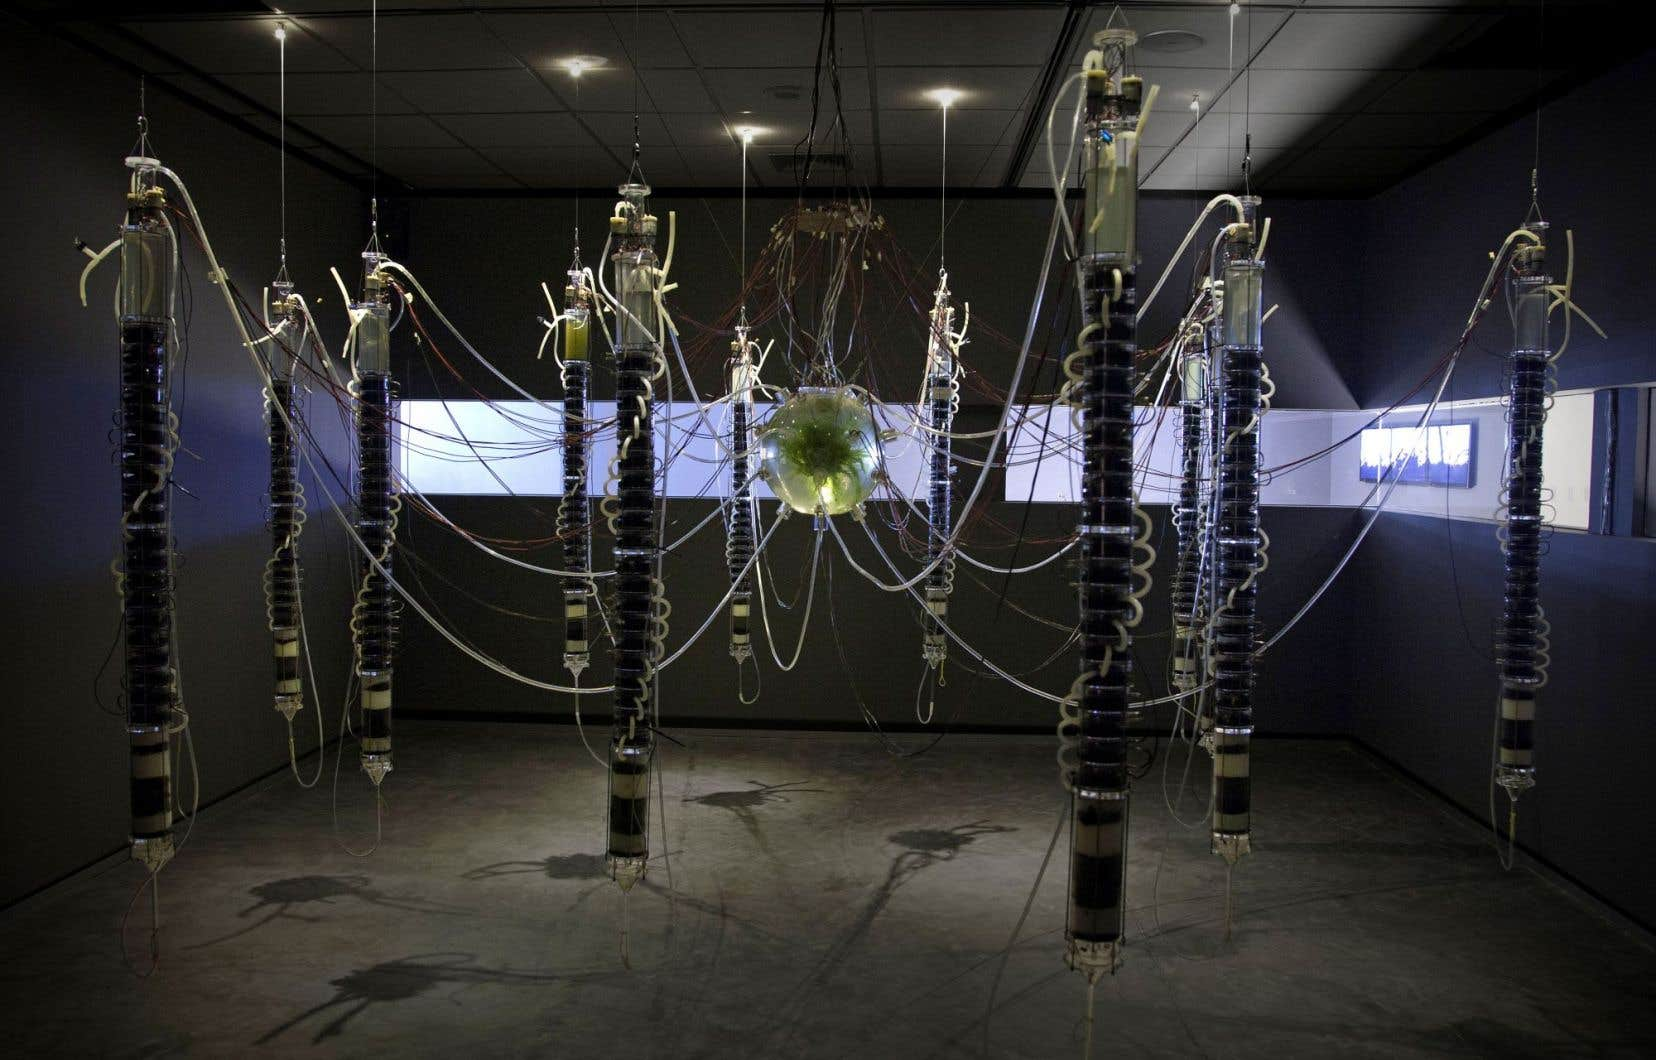 Gilberto Esparza, «Plantas autofotosintéticas» (Plantes autophotosynthétiques), vue de l'installation à l'Espacio Fundación Telephónica, Lima, 2014